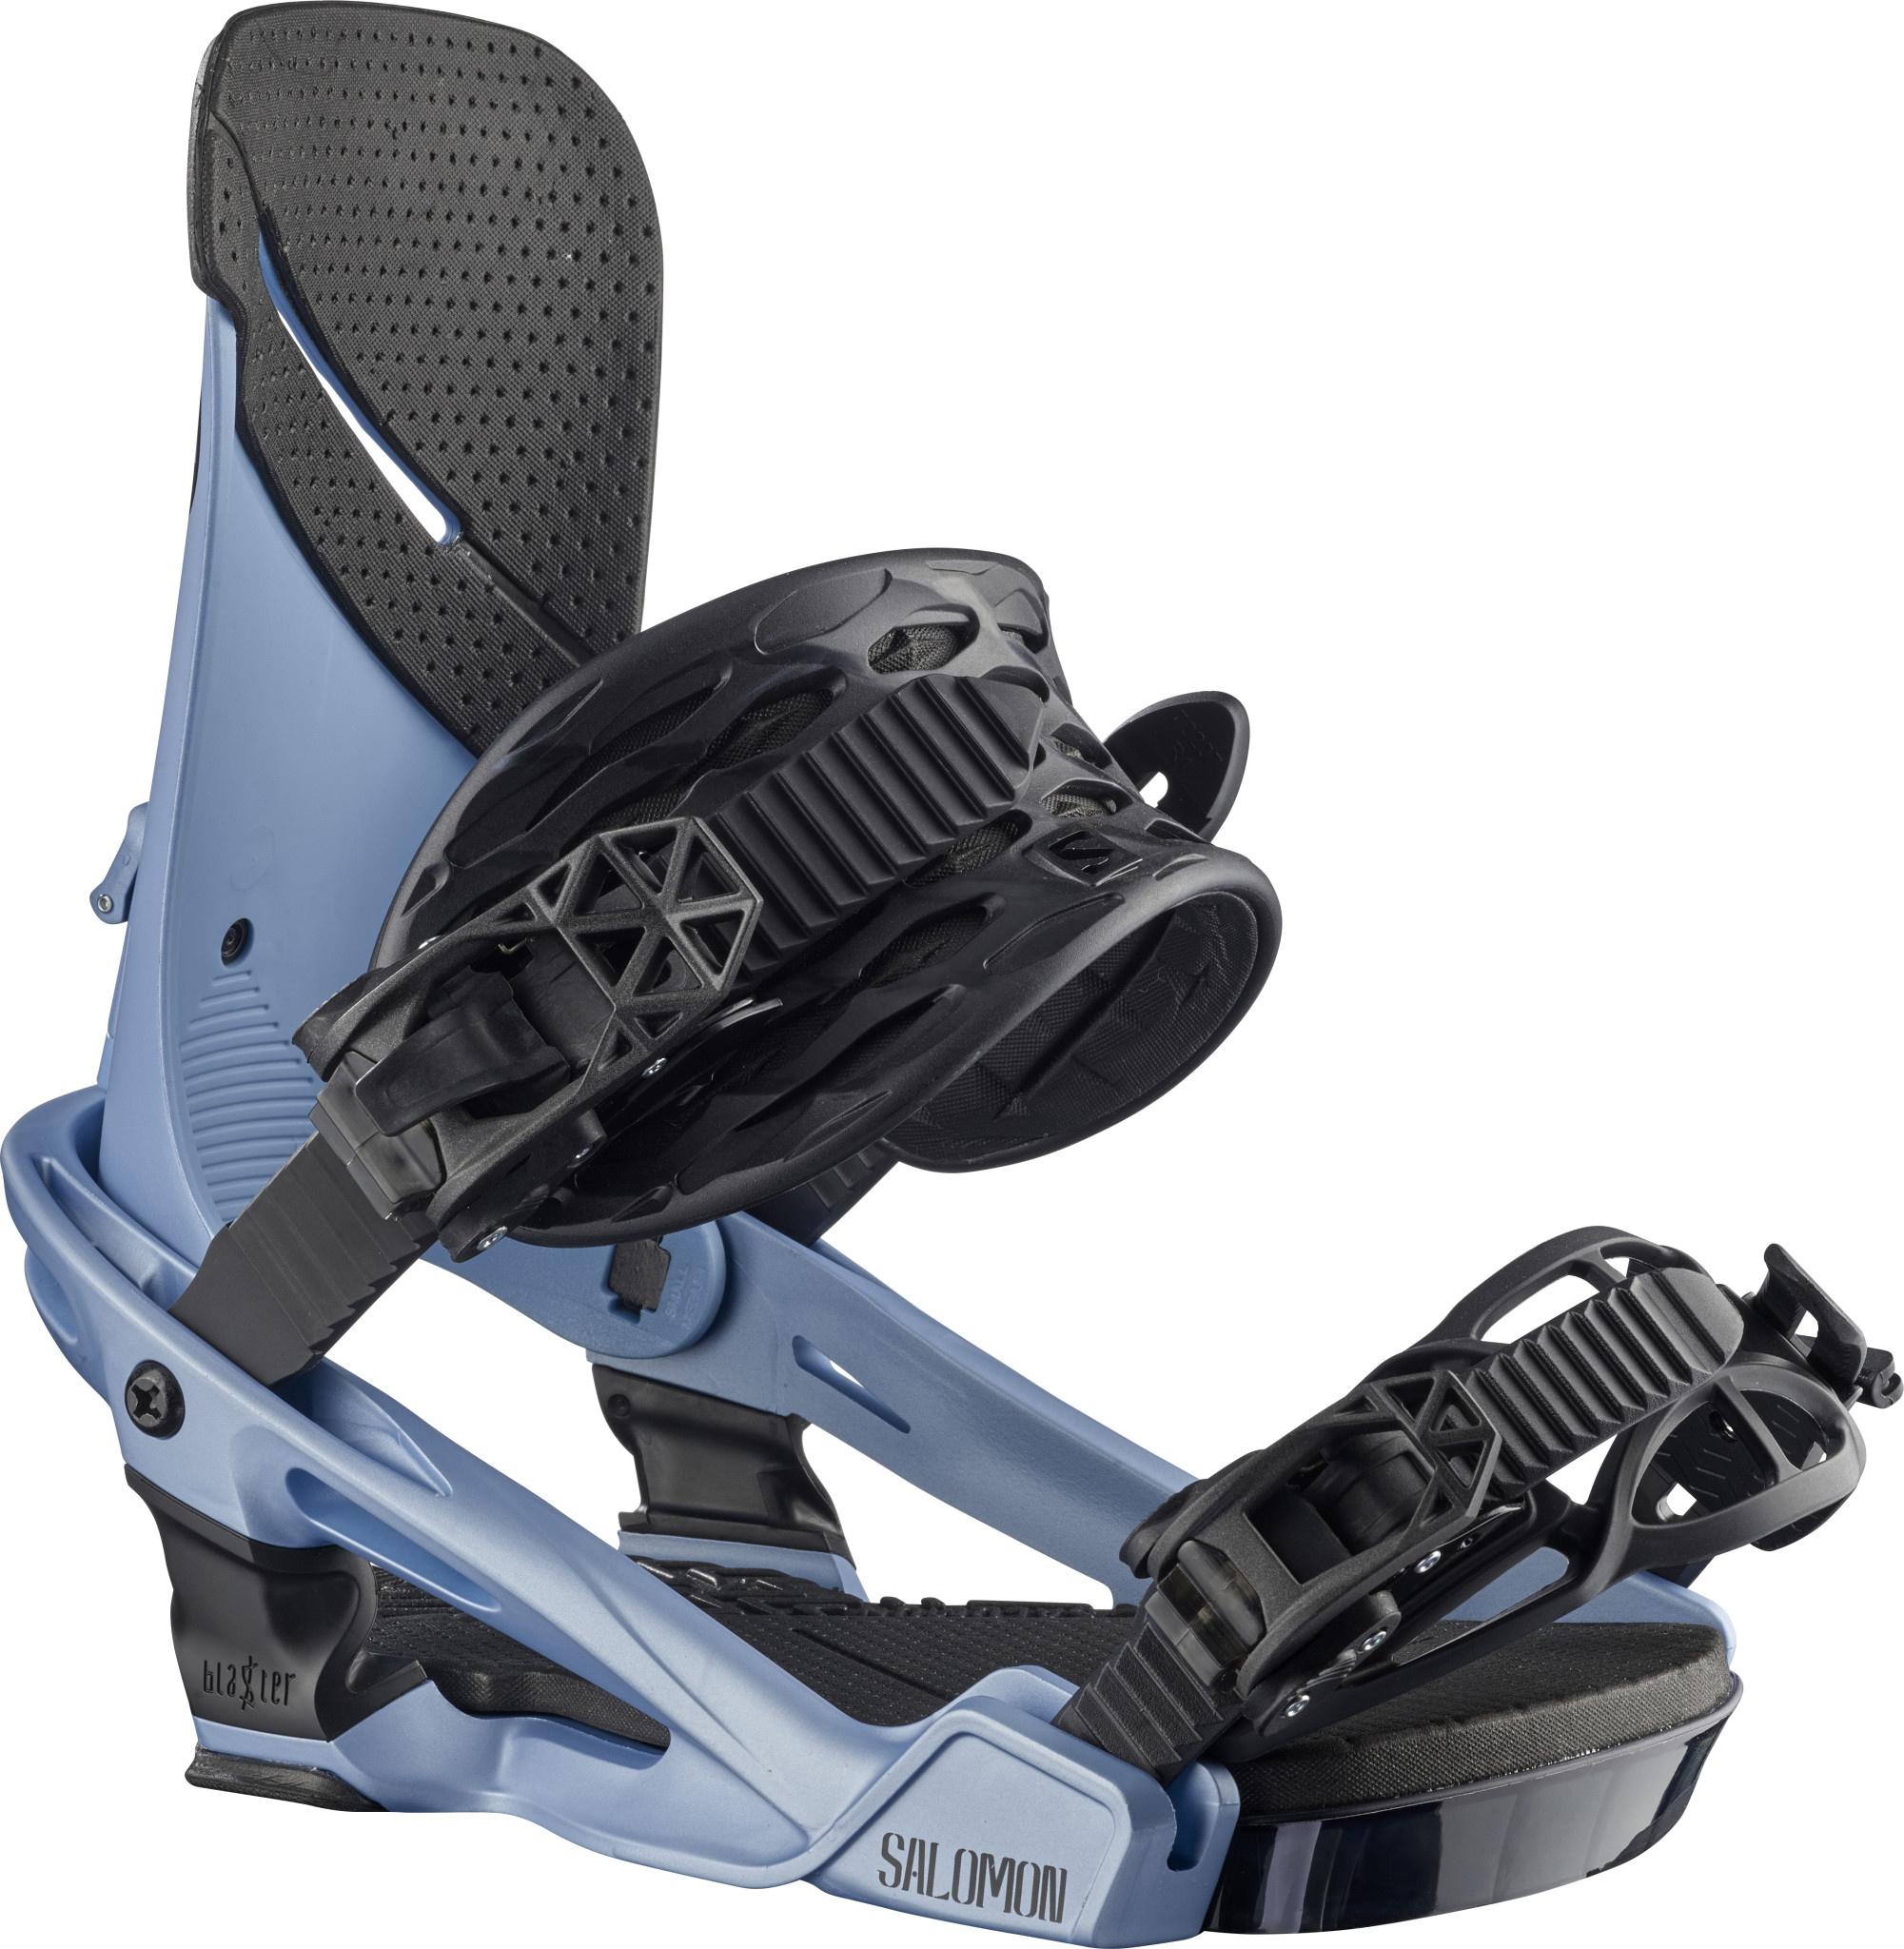 SALOMON Salomon Women's Nova Snowboard Binding (2021)